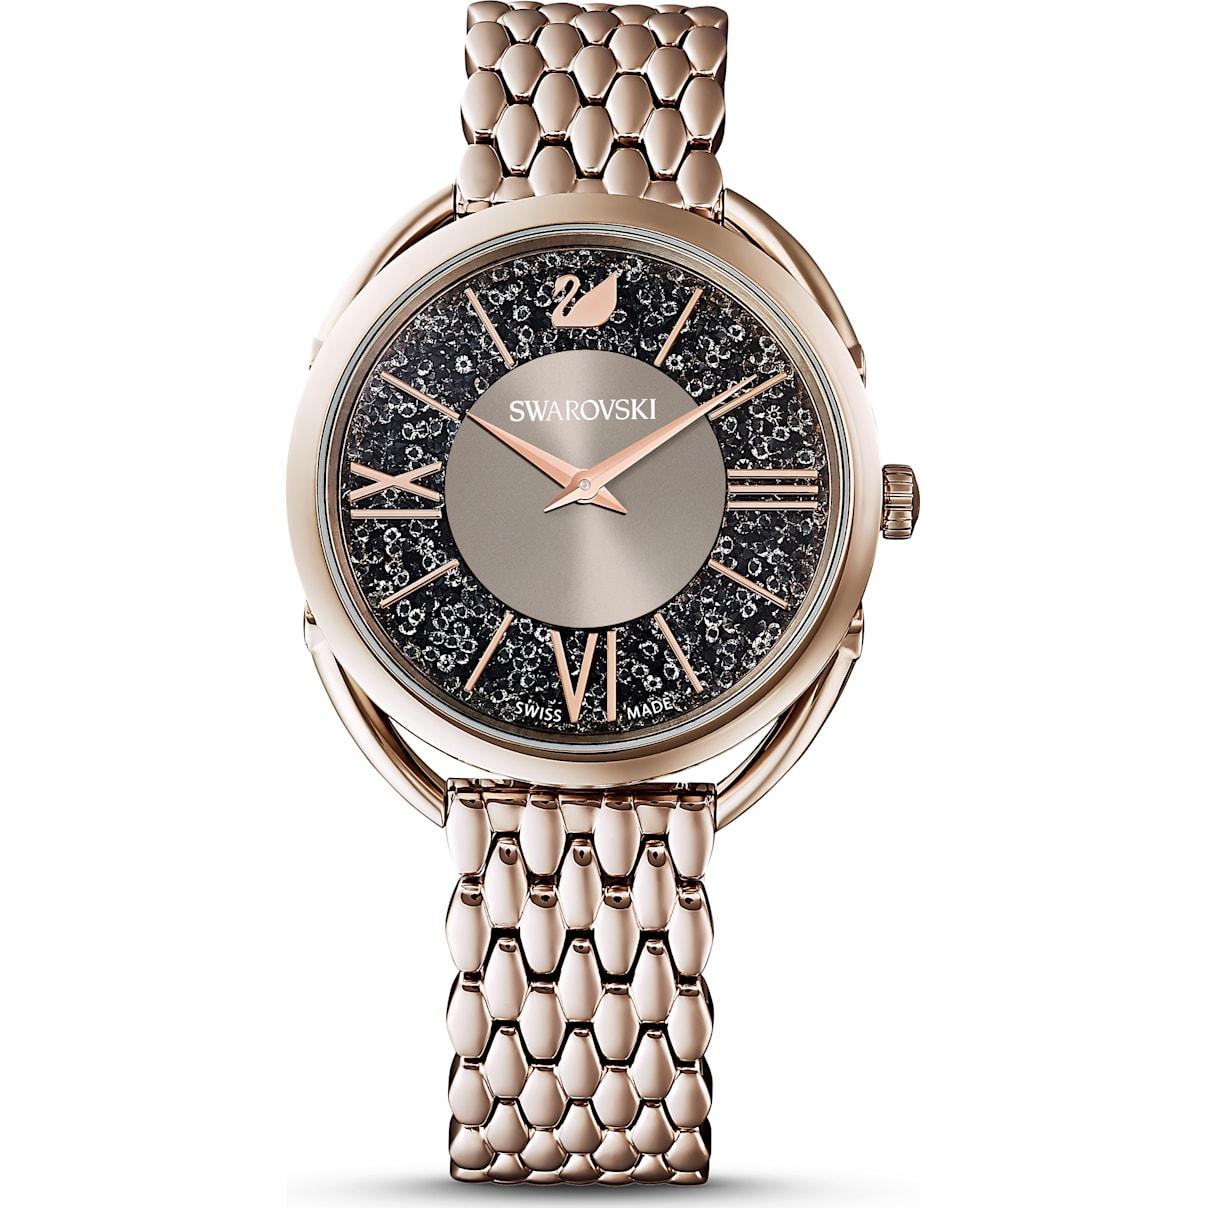 Swarovski Crystalline Glam Watch, Metal bracelet, Gray, Champagne-gold tone PVD